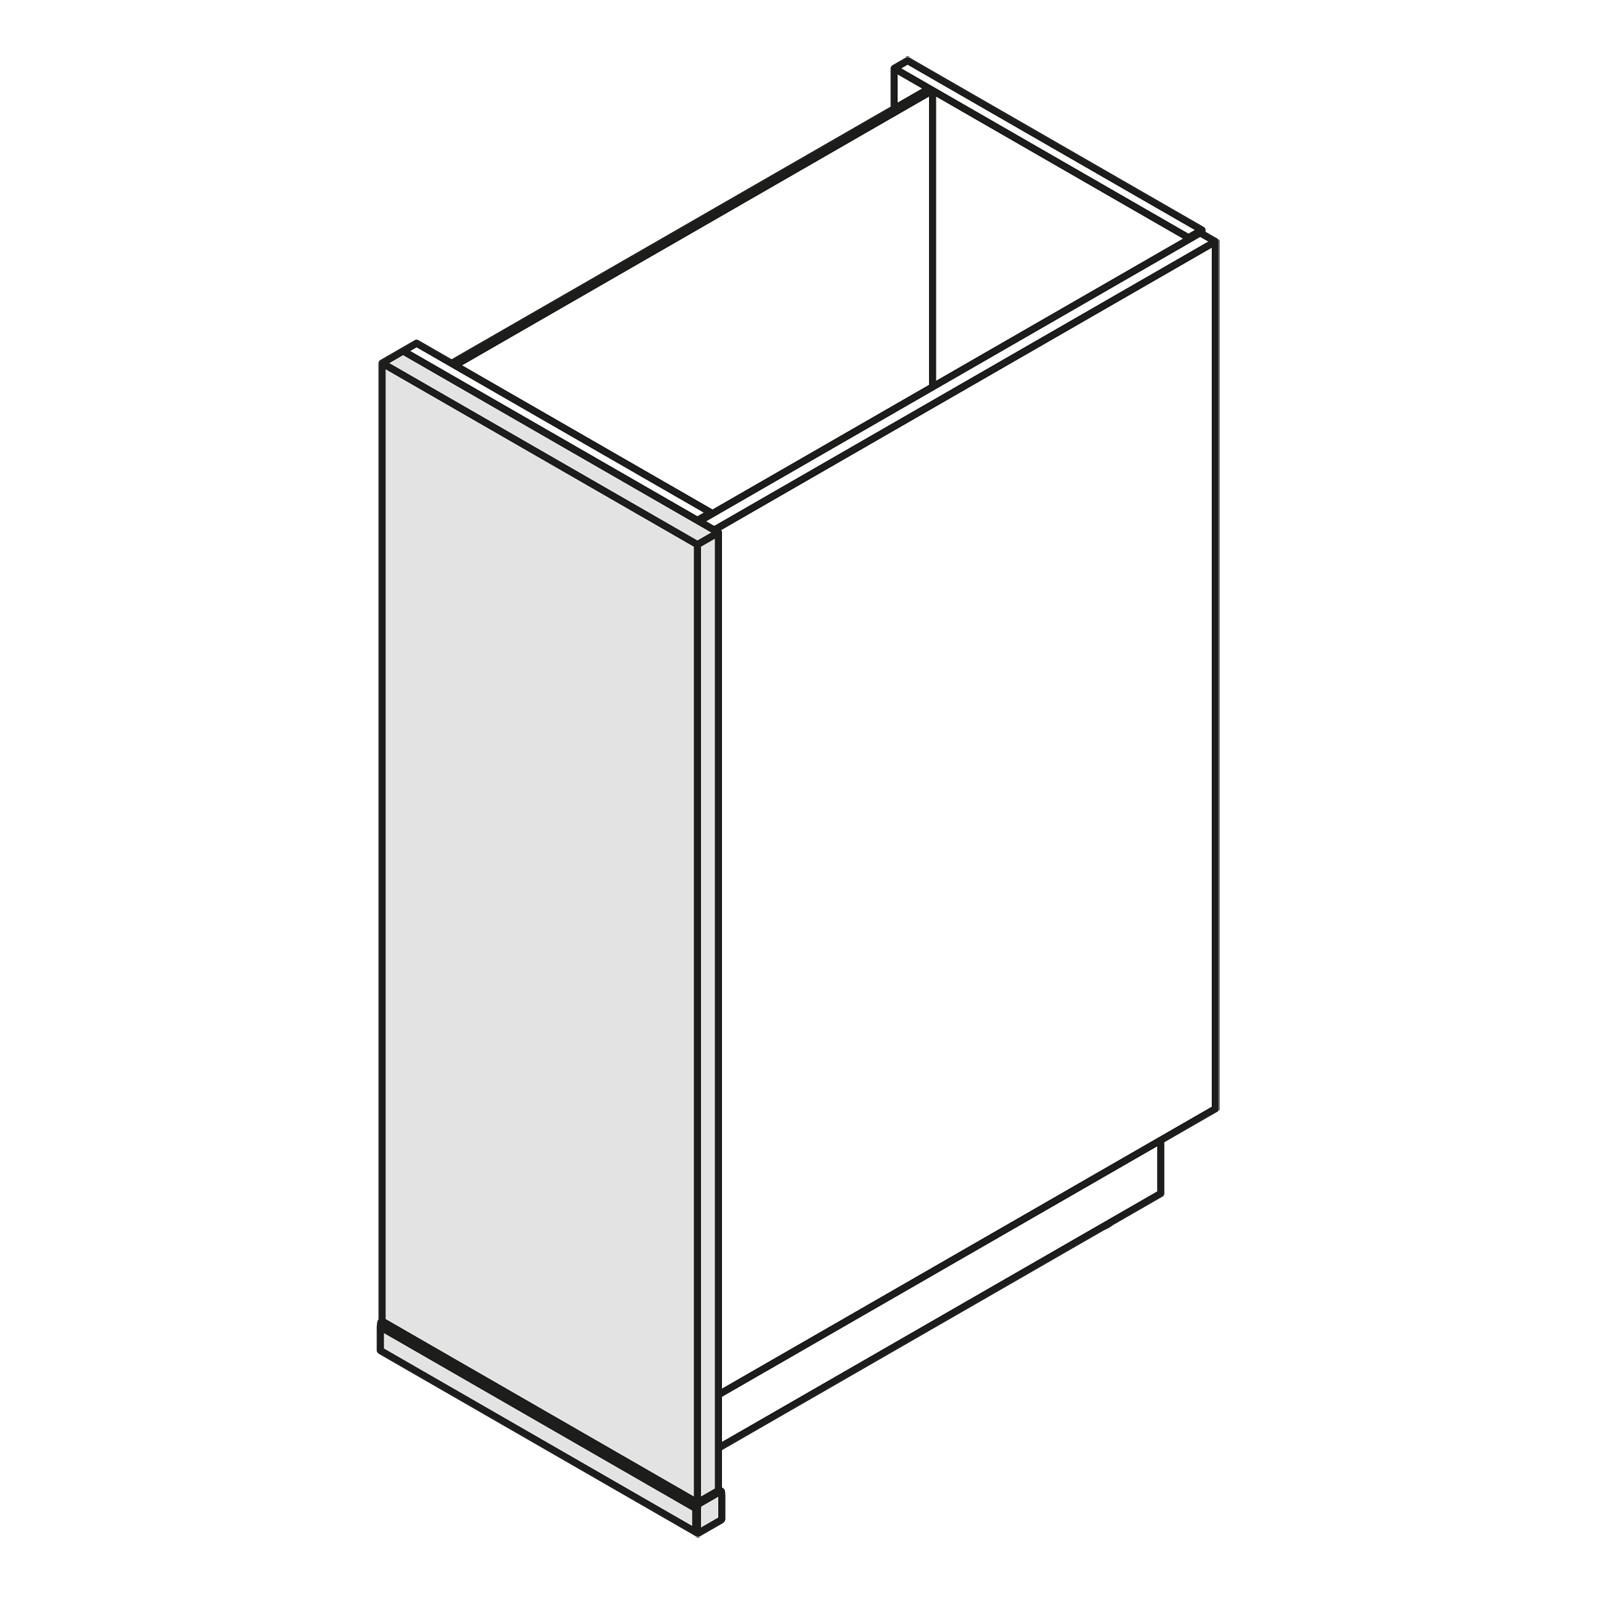 nolte k chen wange bodentief w16 u90 39. Black Bedroom Furniture Sets. Home Design Ideas